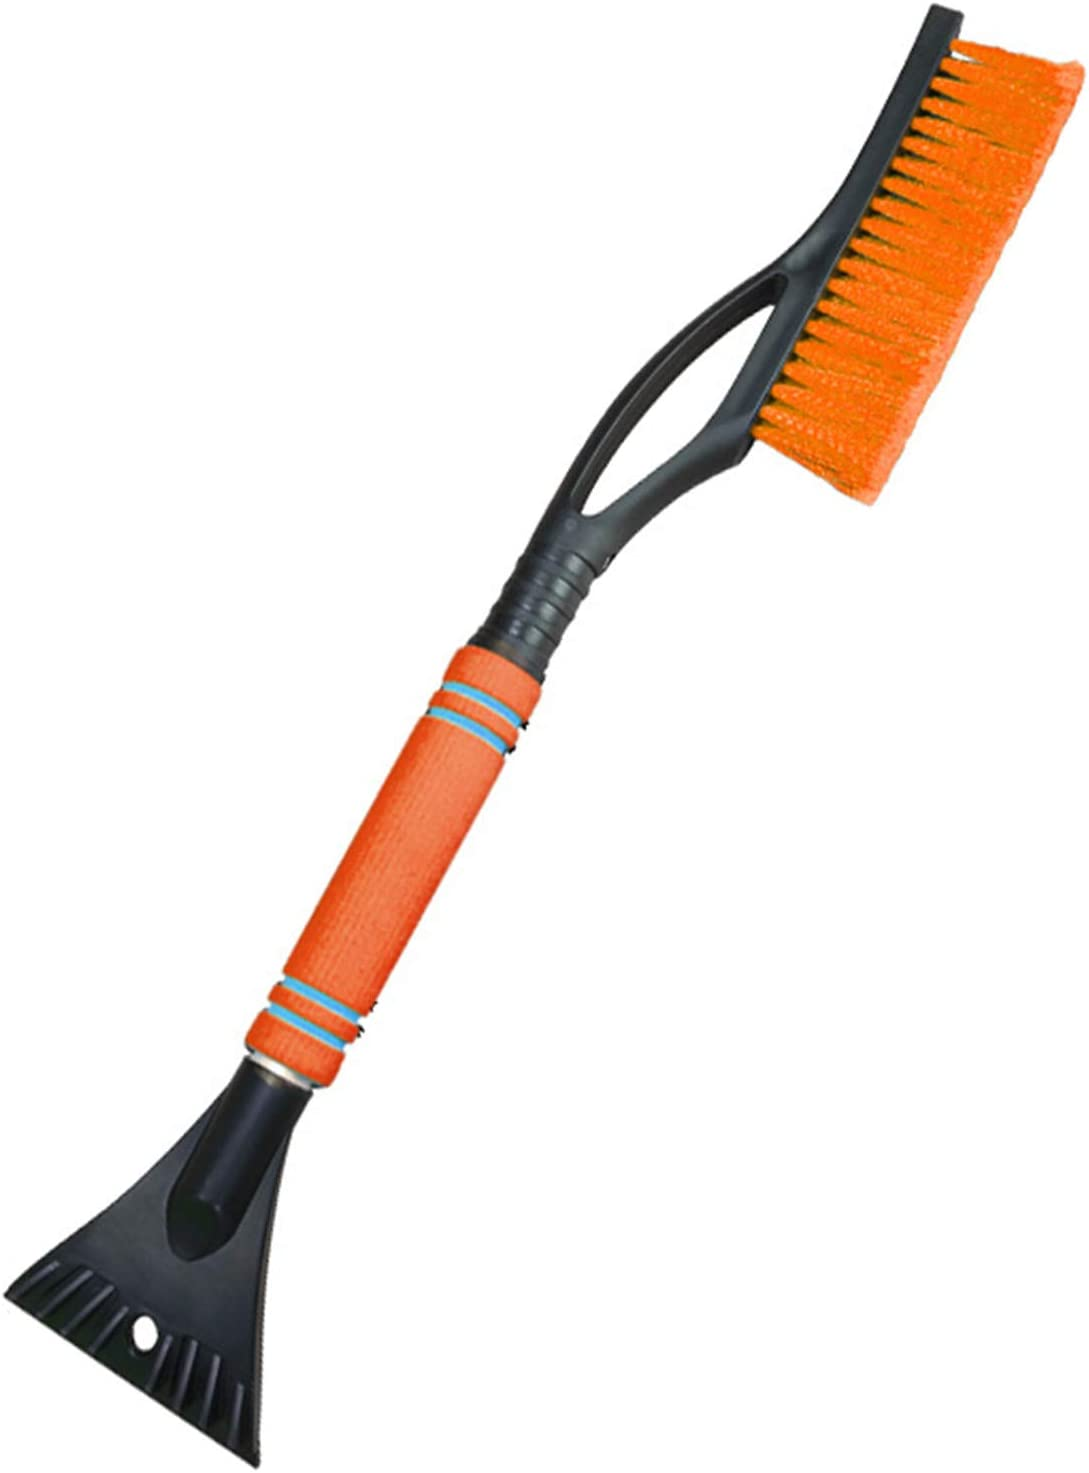 Snow Brush 2in1 Ice Scraper Removable Snow Brush with Ergonomic Foam Handle for Universal Cars Orange Elibeauty Snow Brush Ice Scraper